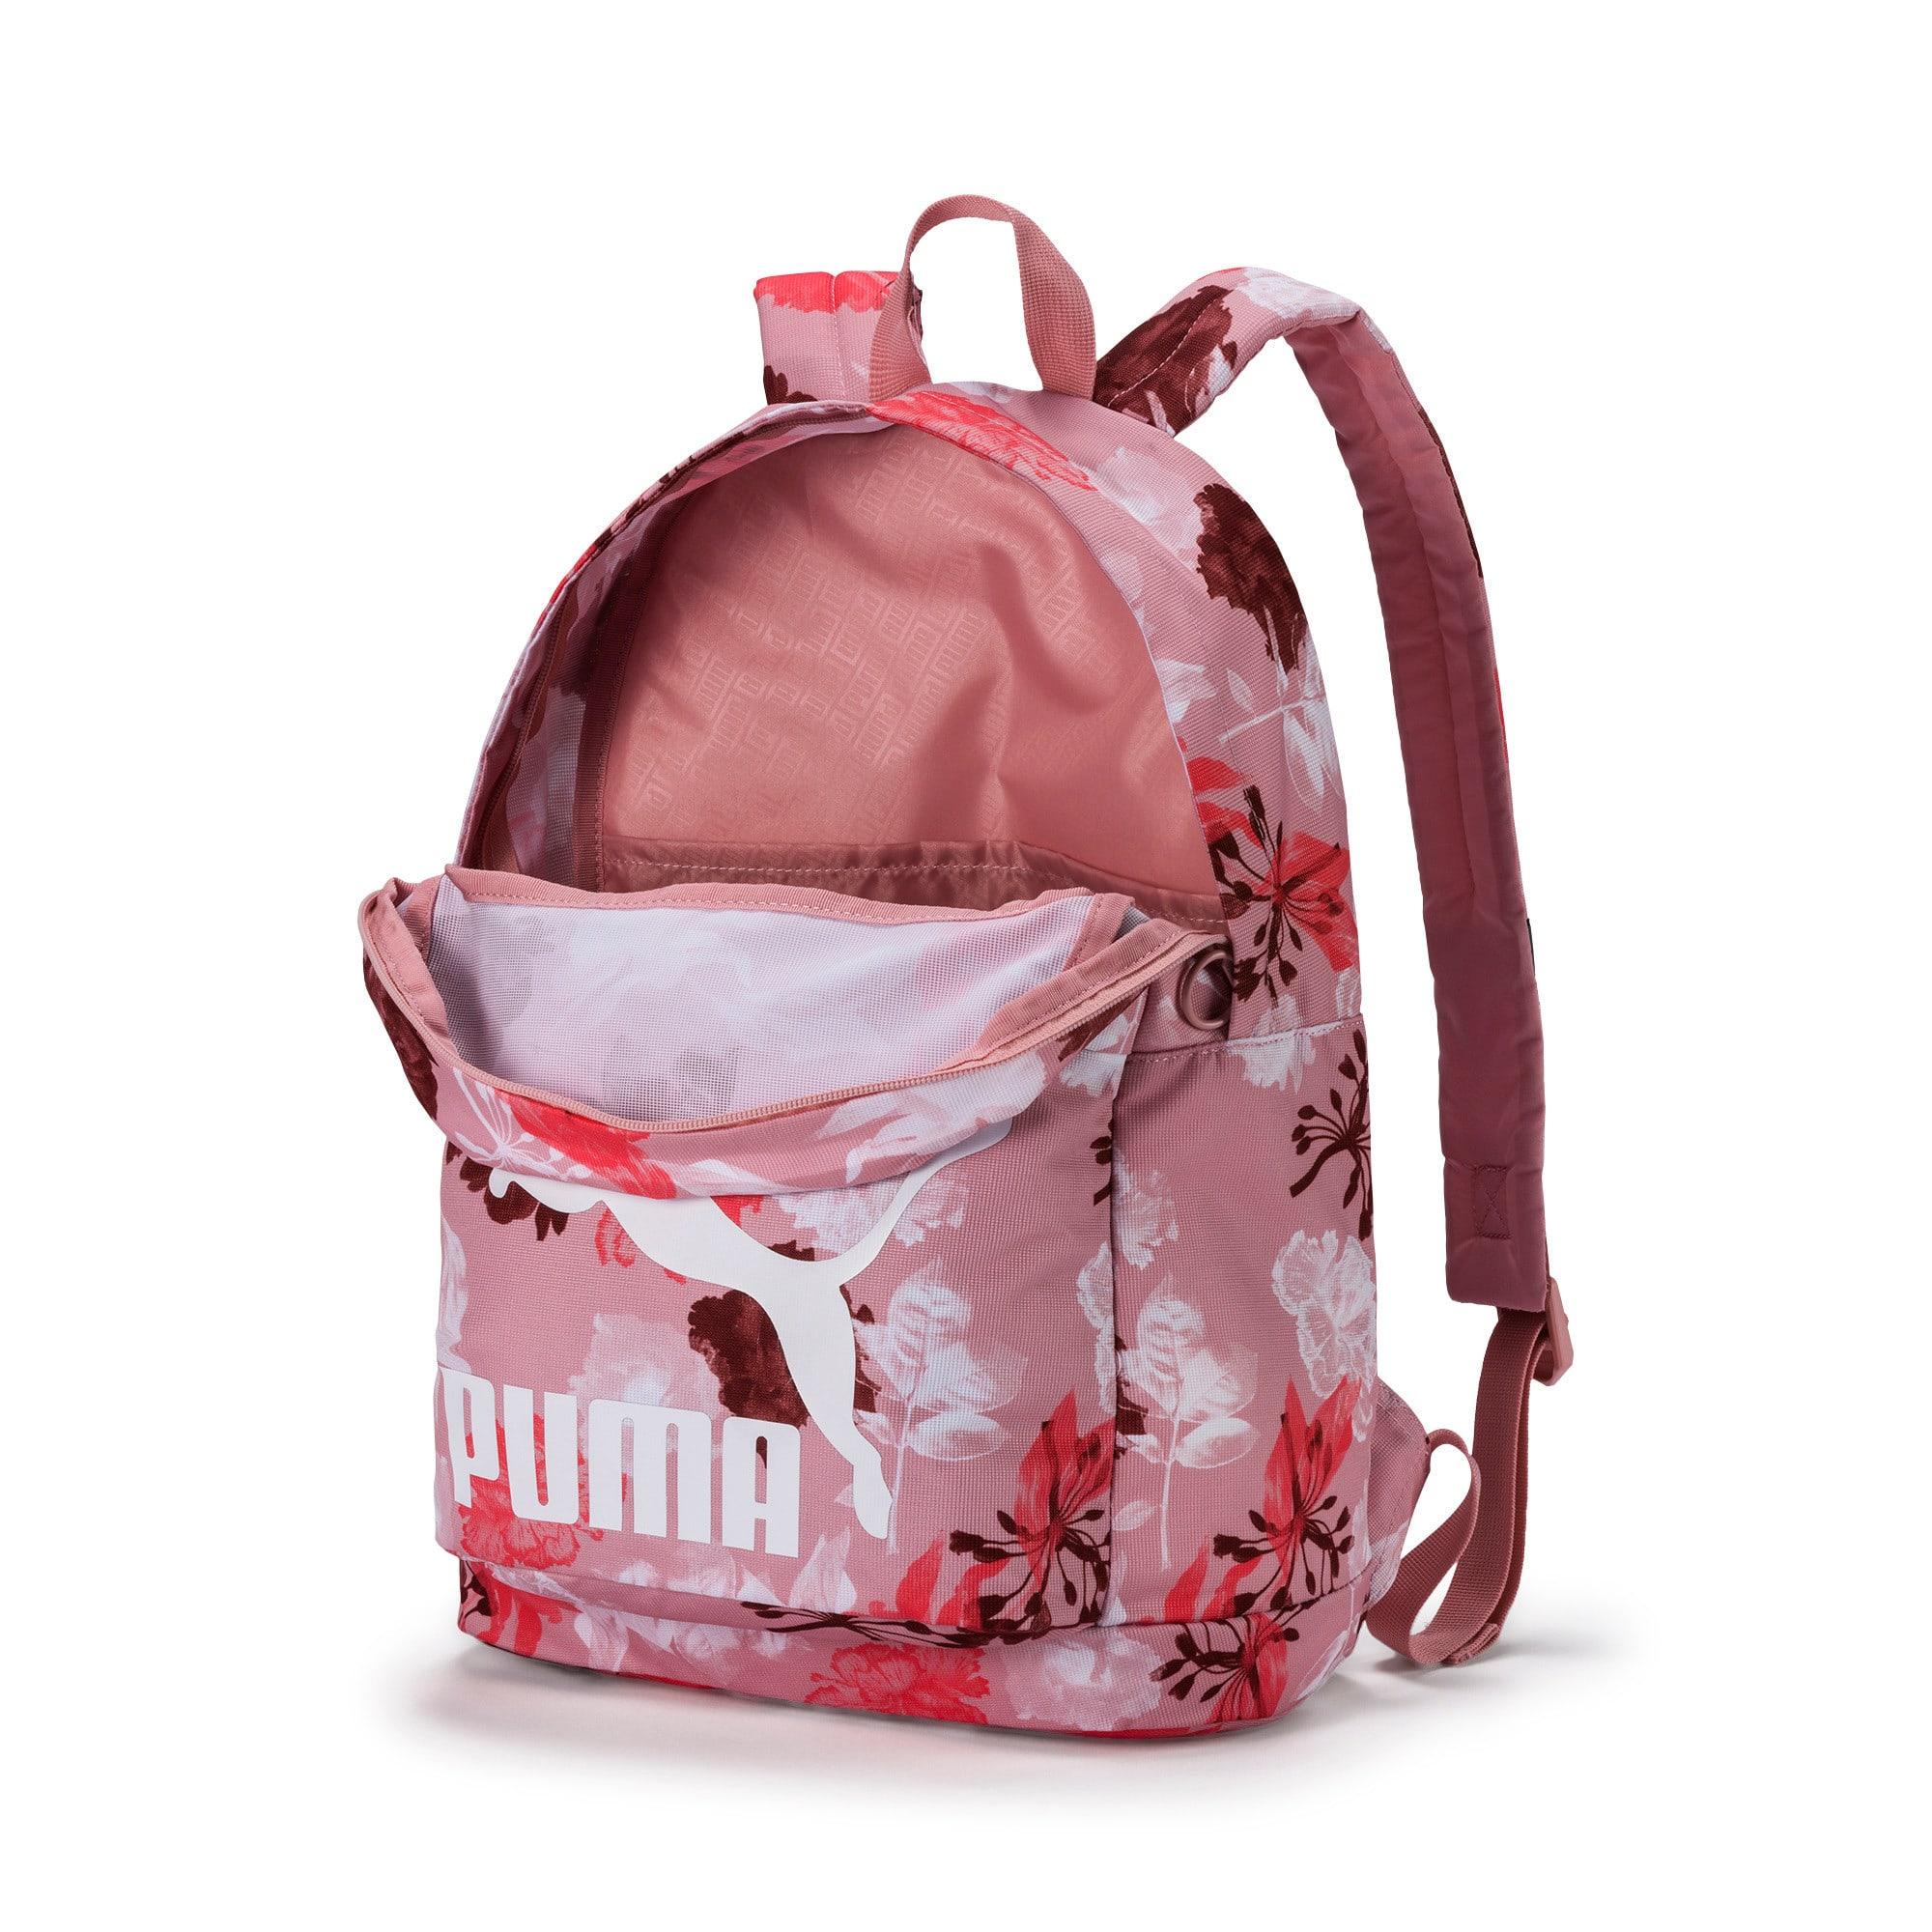 Thumbnail 4 of Originals Backpack, Bridal Rose-AOP, medium